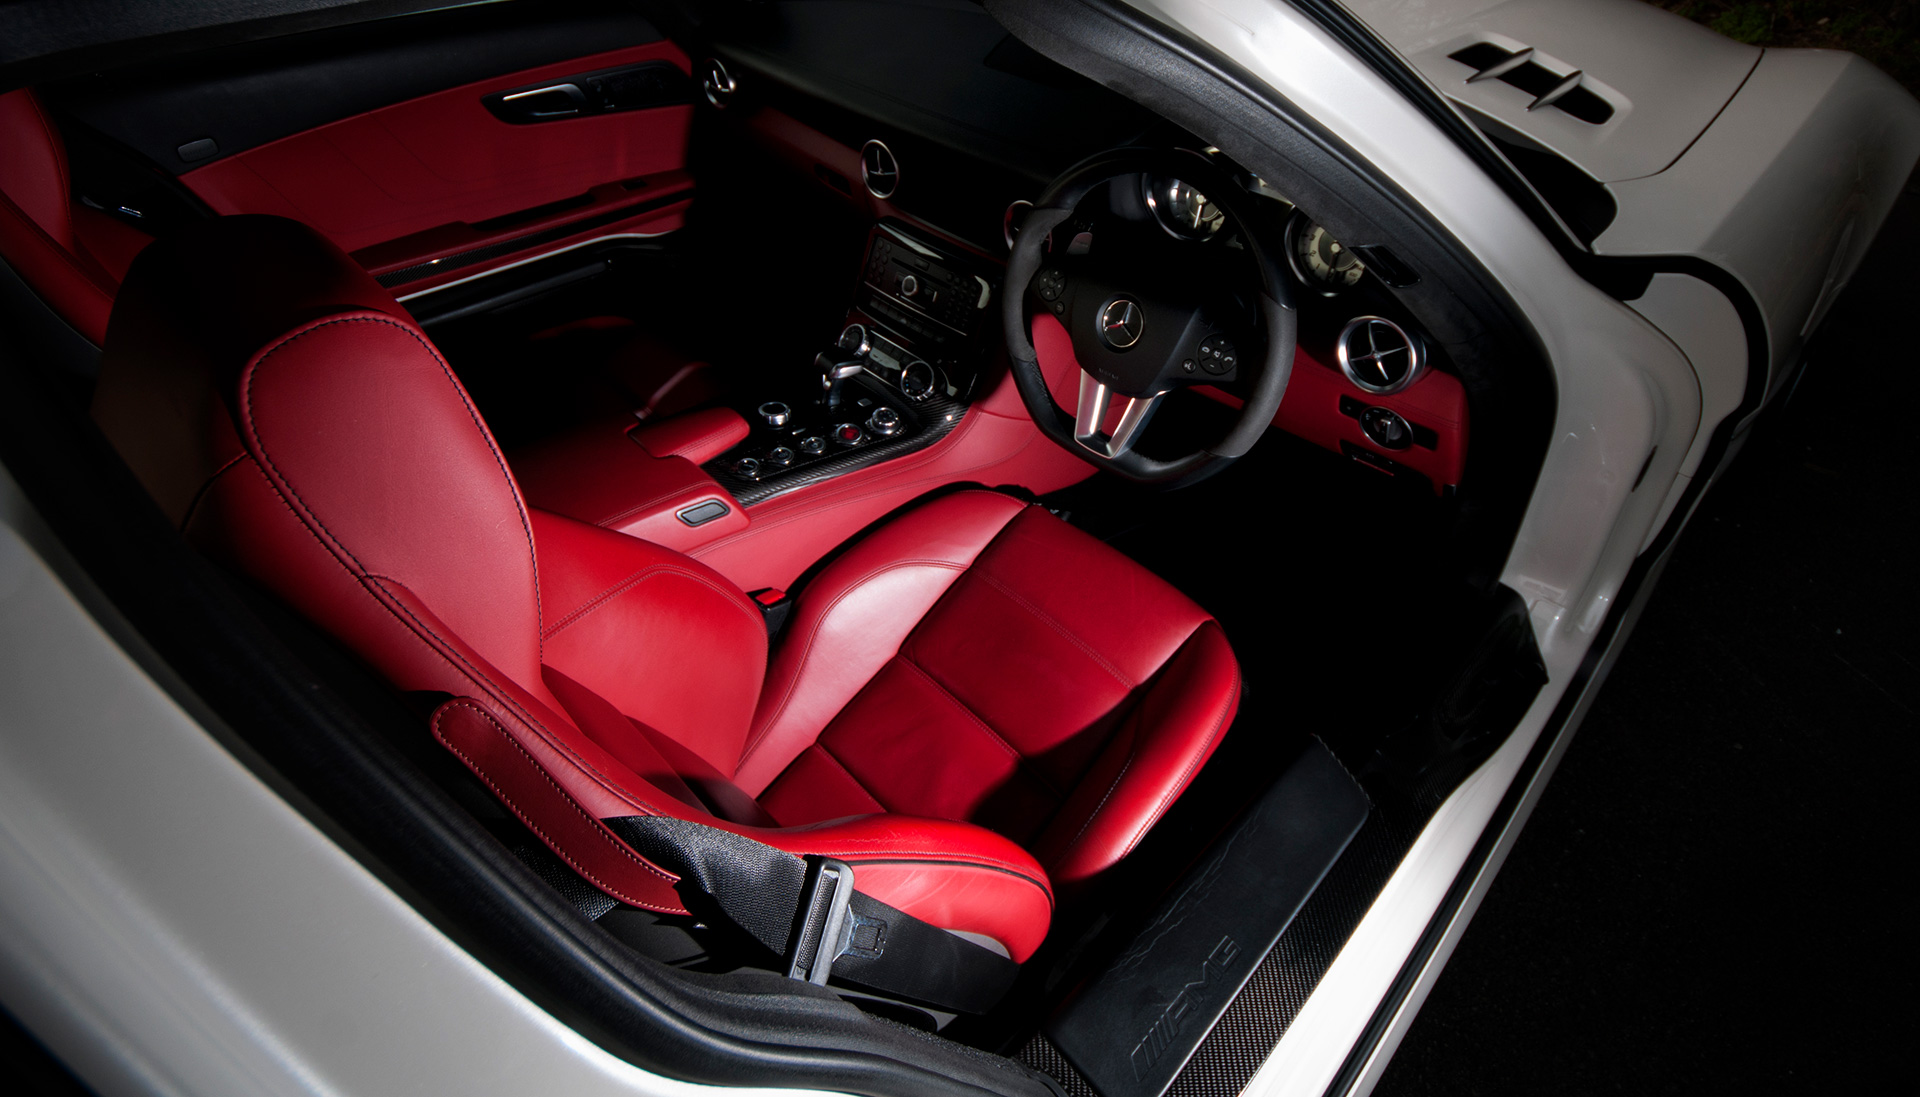 Mercedes SLS AMG Gullwing interior